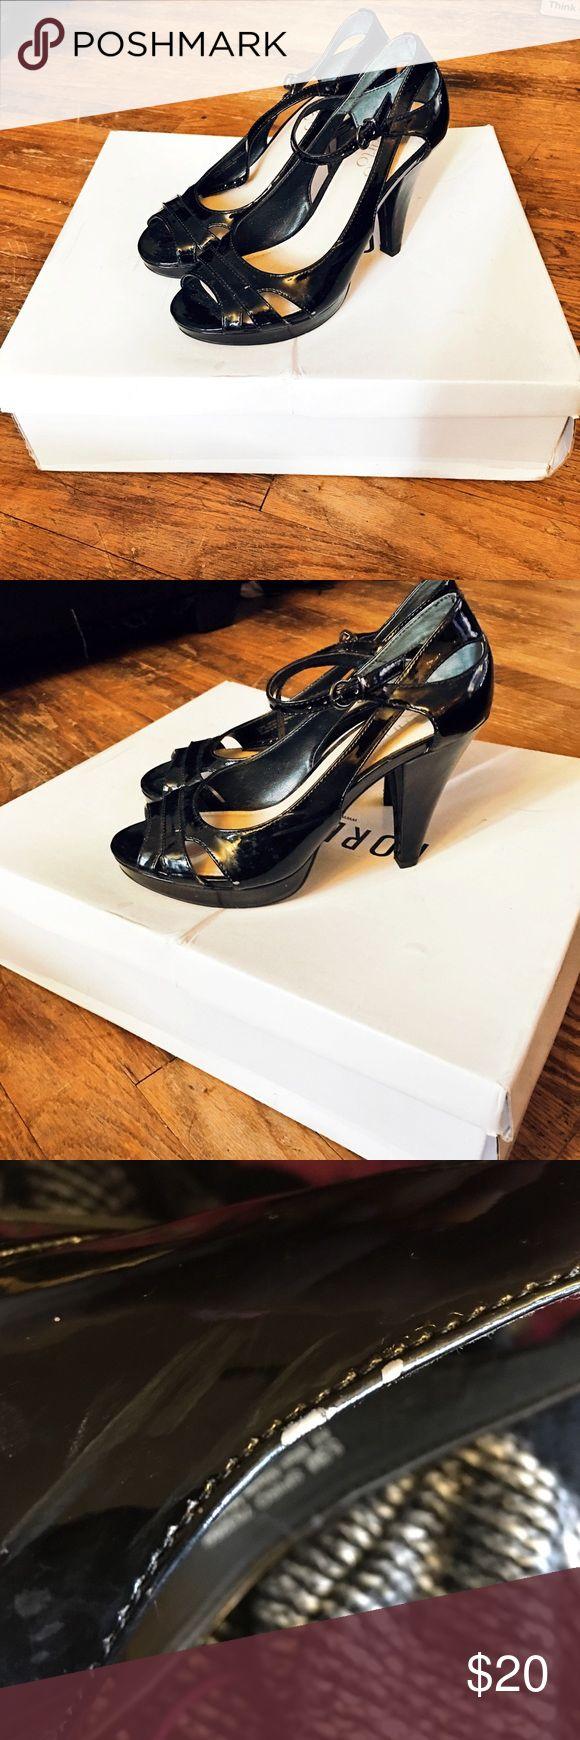 Franco Sarto Sleek Black Heels Only worn twice. Very minimal signs of wear. Franco Sarto Shoes Heels